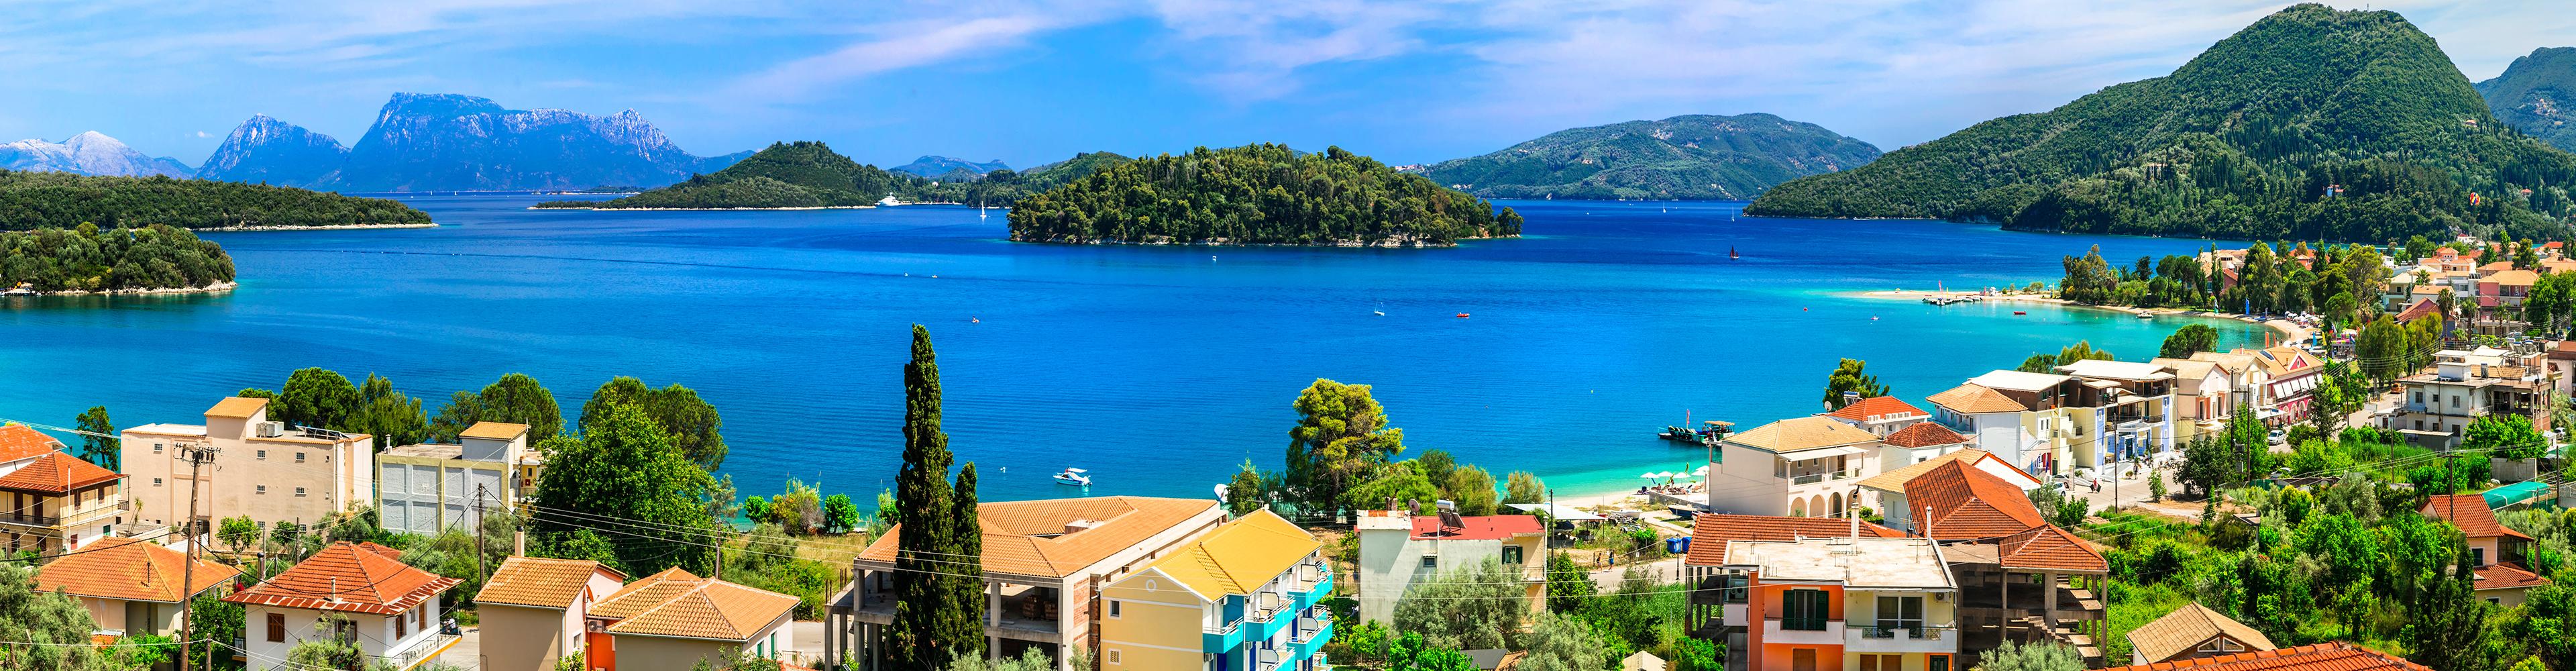 Ionian Islands Sailing Adventure from Corfu